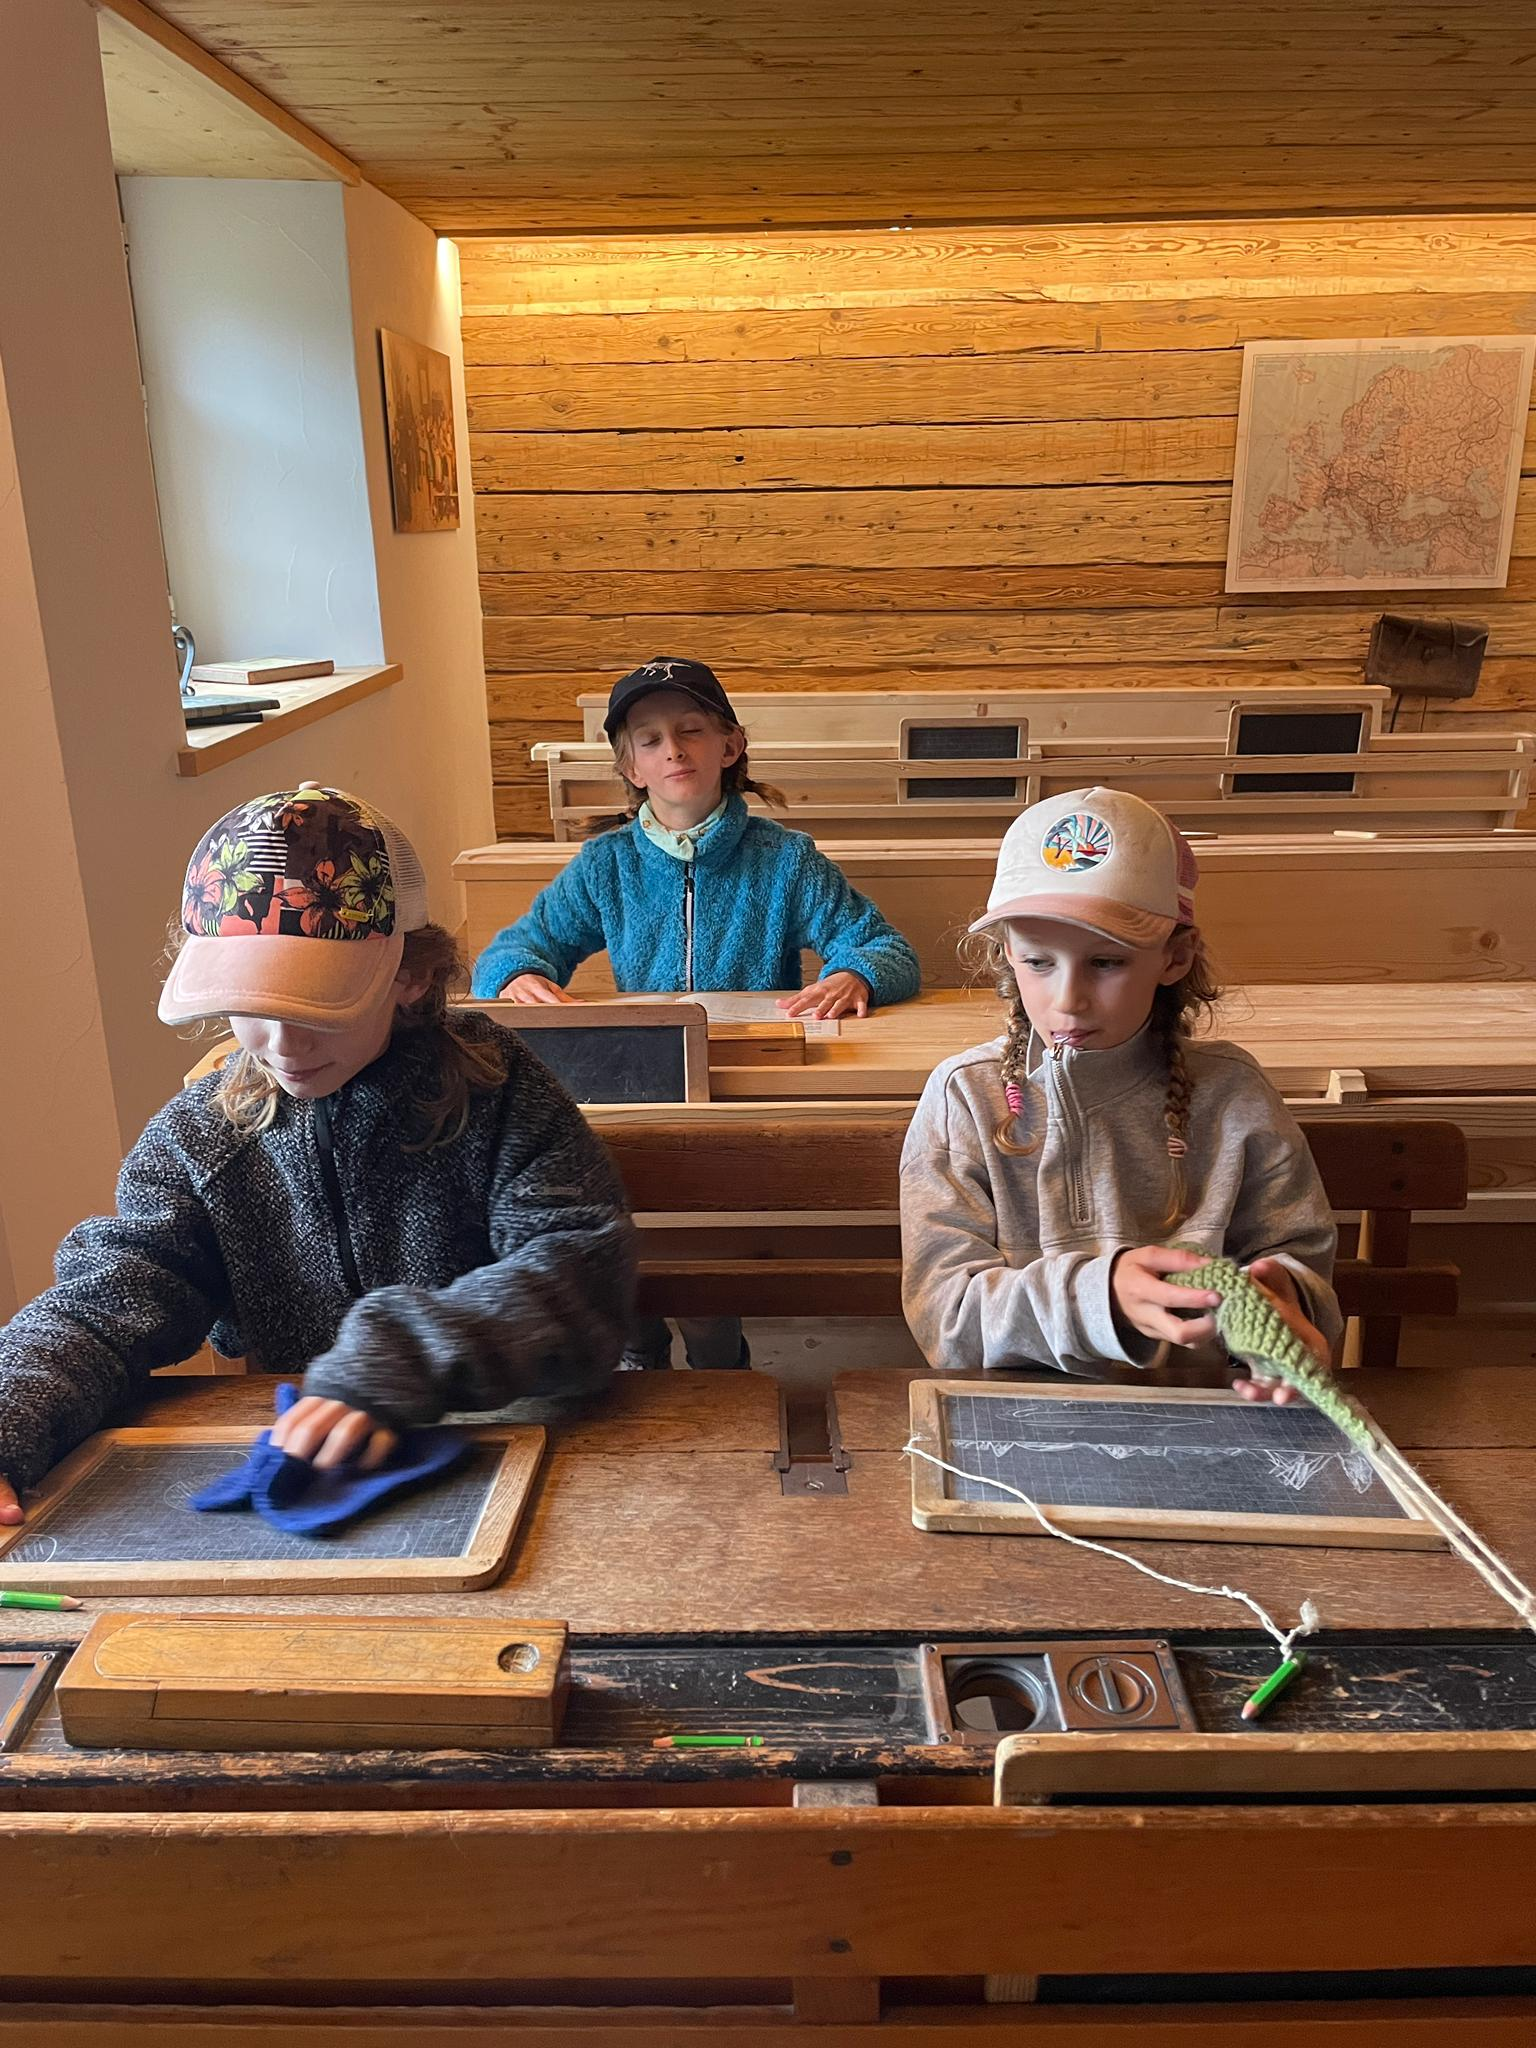 Voyage de la famille Cavadini: l'école de Heidi